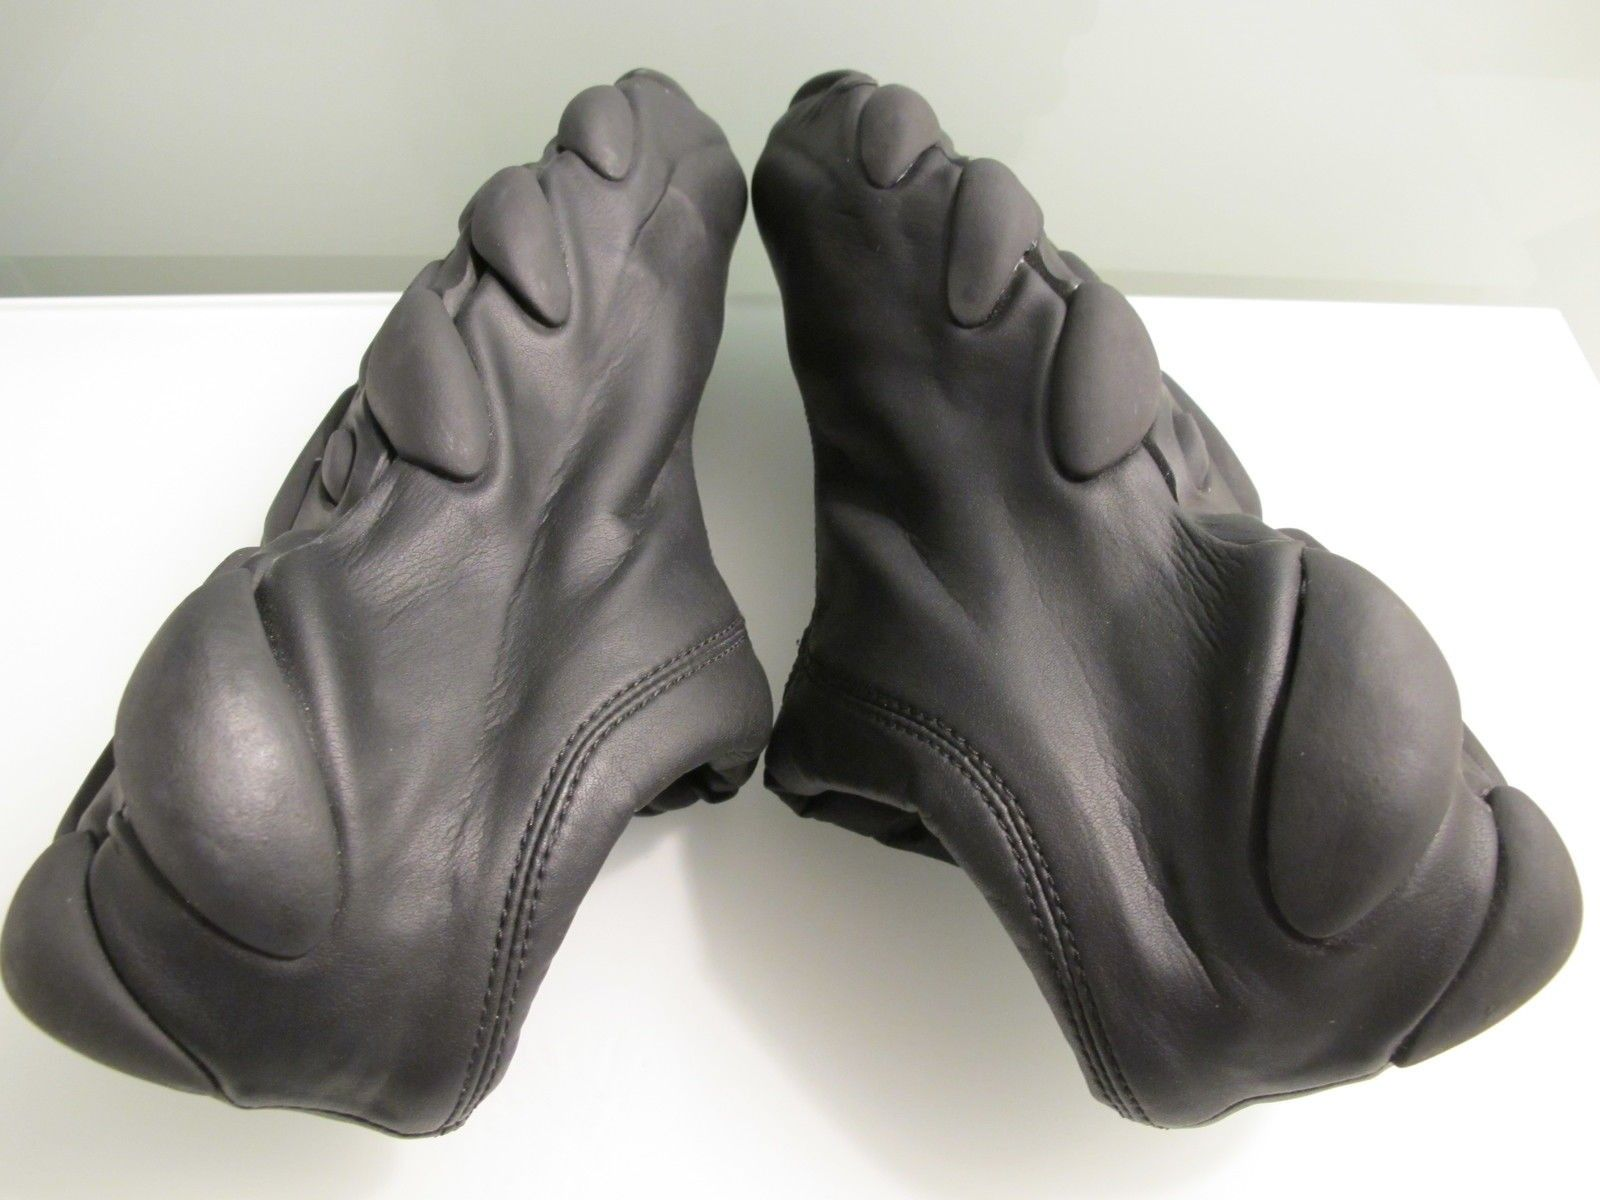 Arrowhead/ Flesh Prototype Shoes...anyone has any info on this? - $_57 (2).jpg